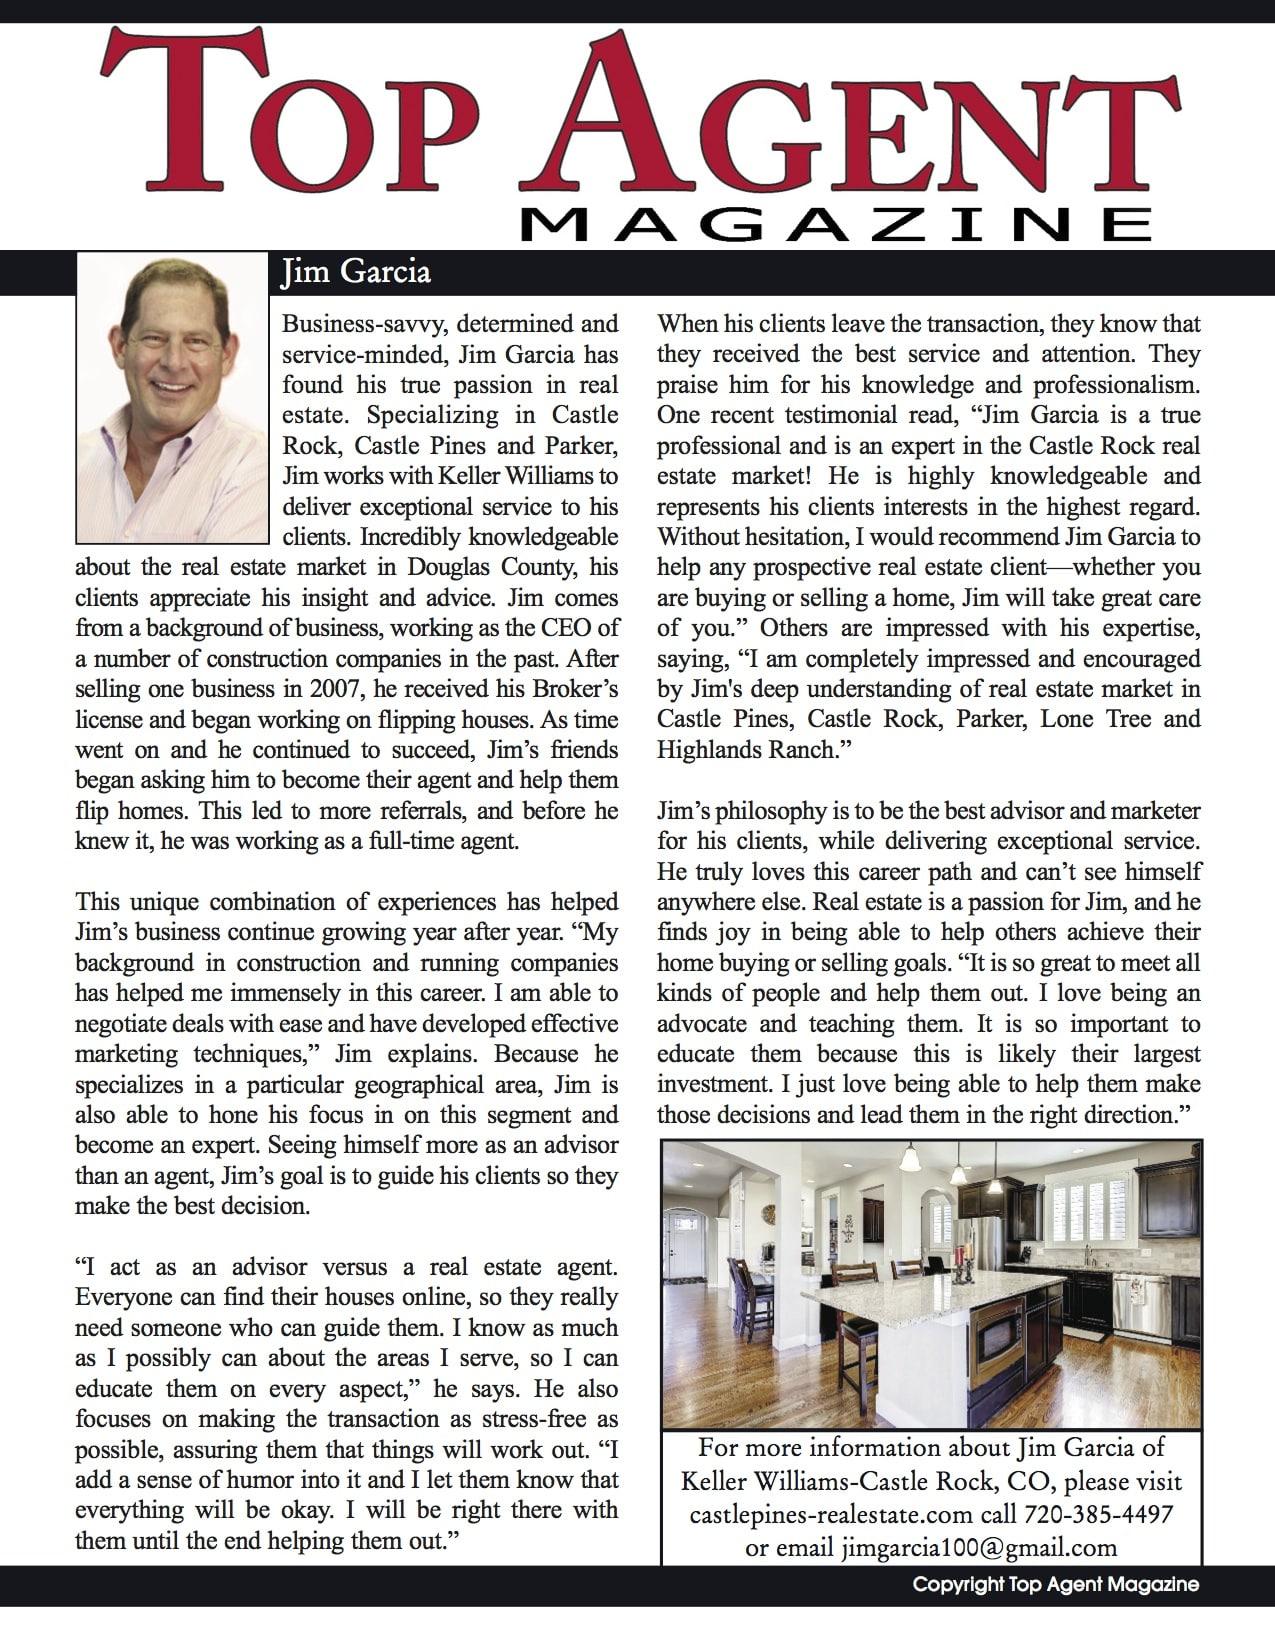 Top Agent Magazine - Best Realtor in Castle Rock CO